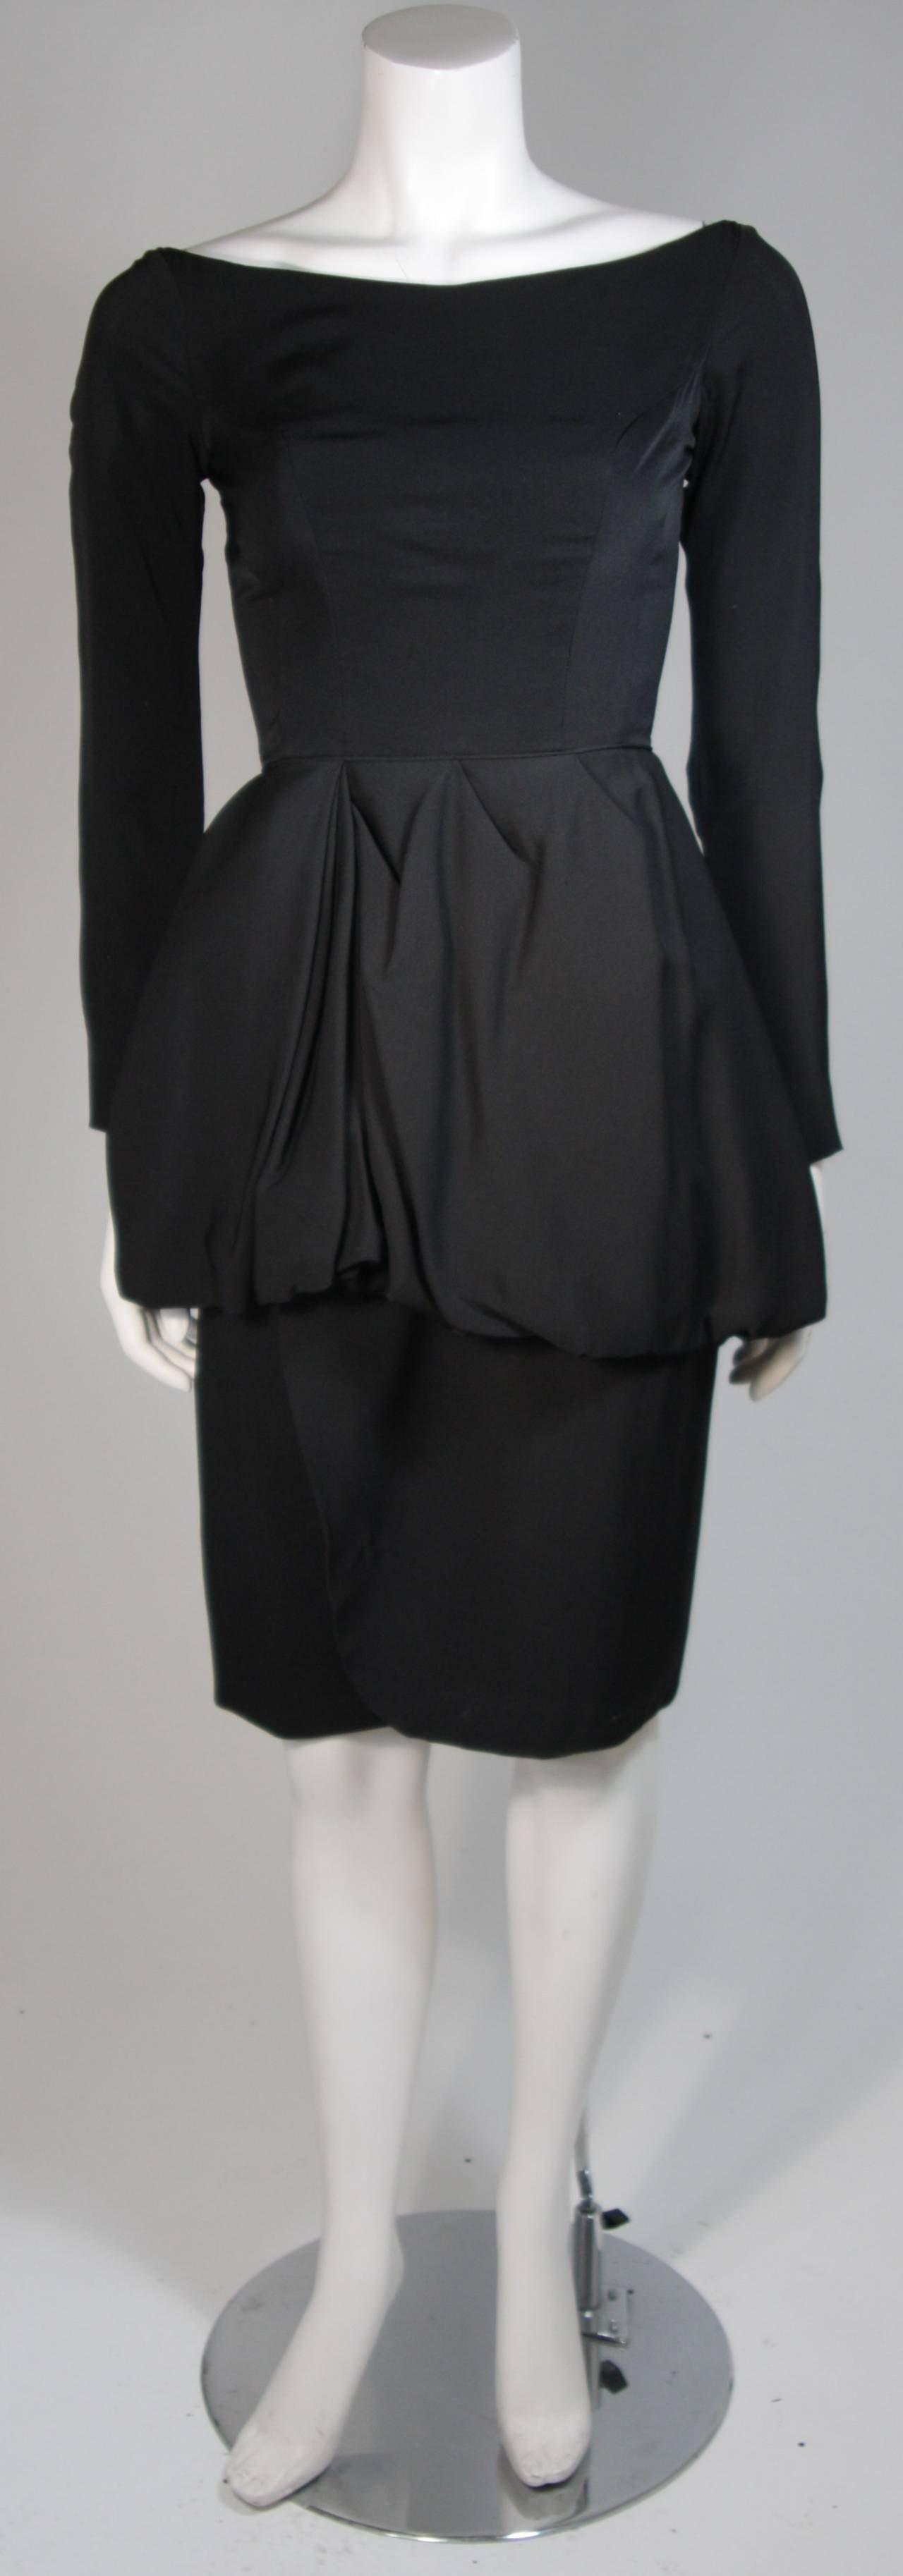 Ceil Chapman Black Draped Princess Seam Peplum Style Waist Dress Size XS 2